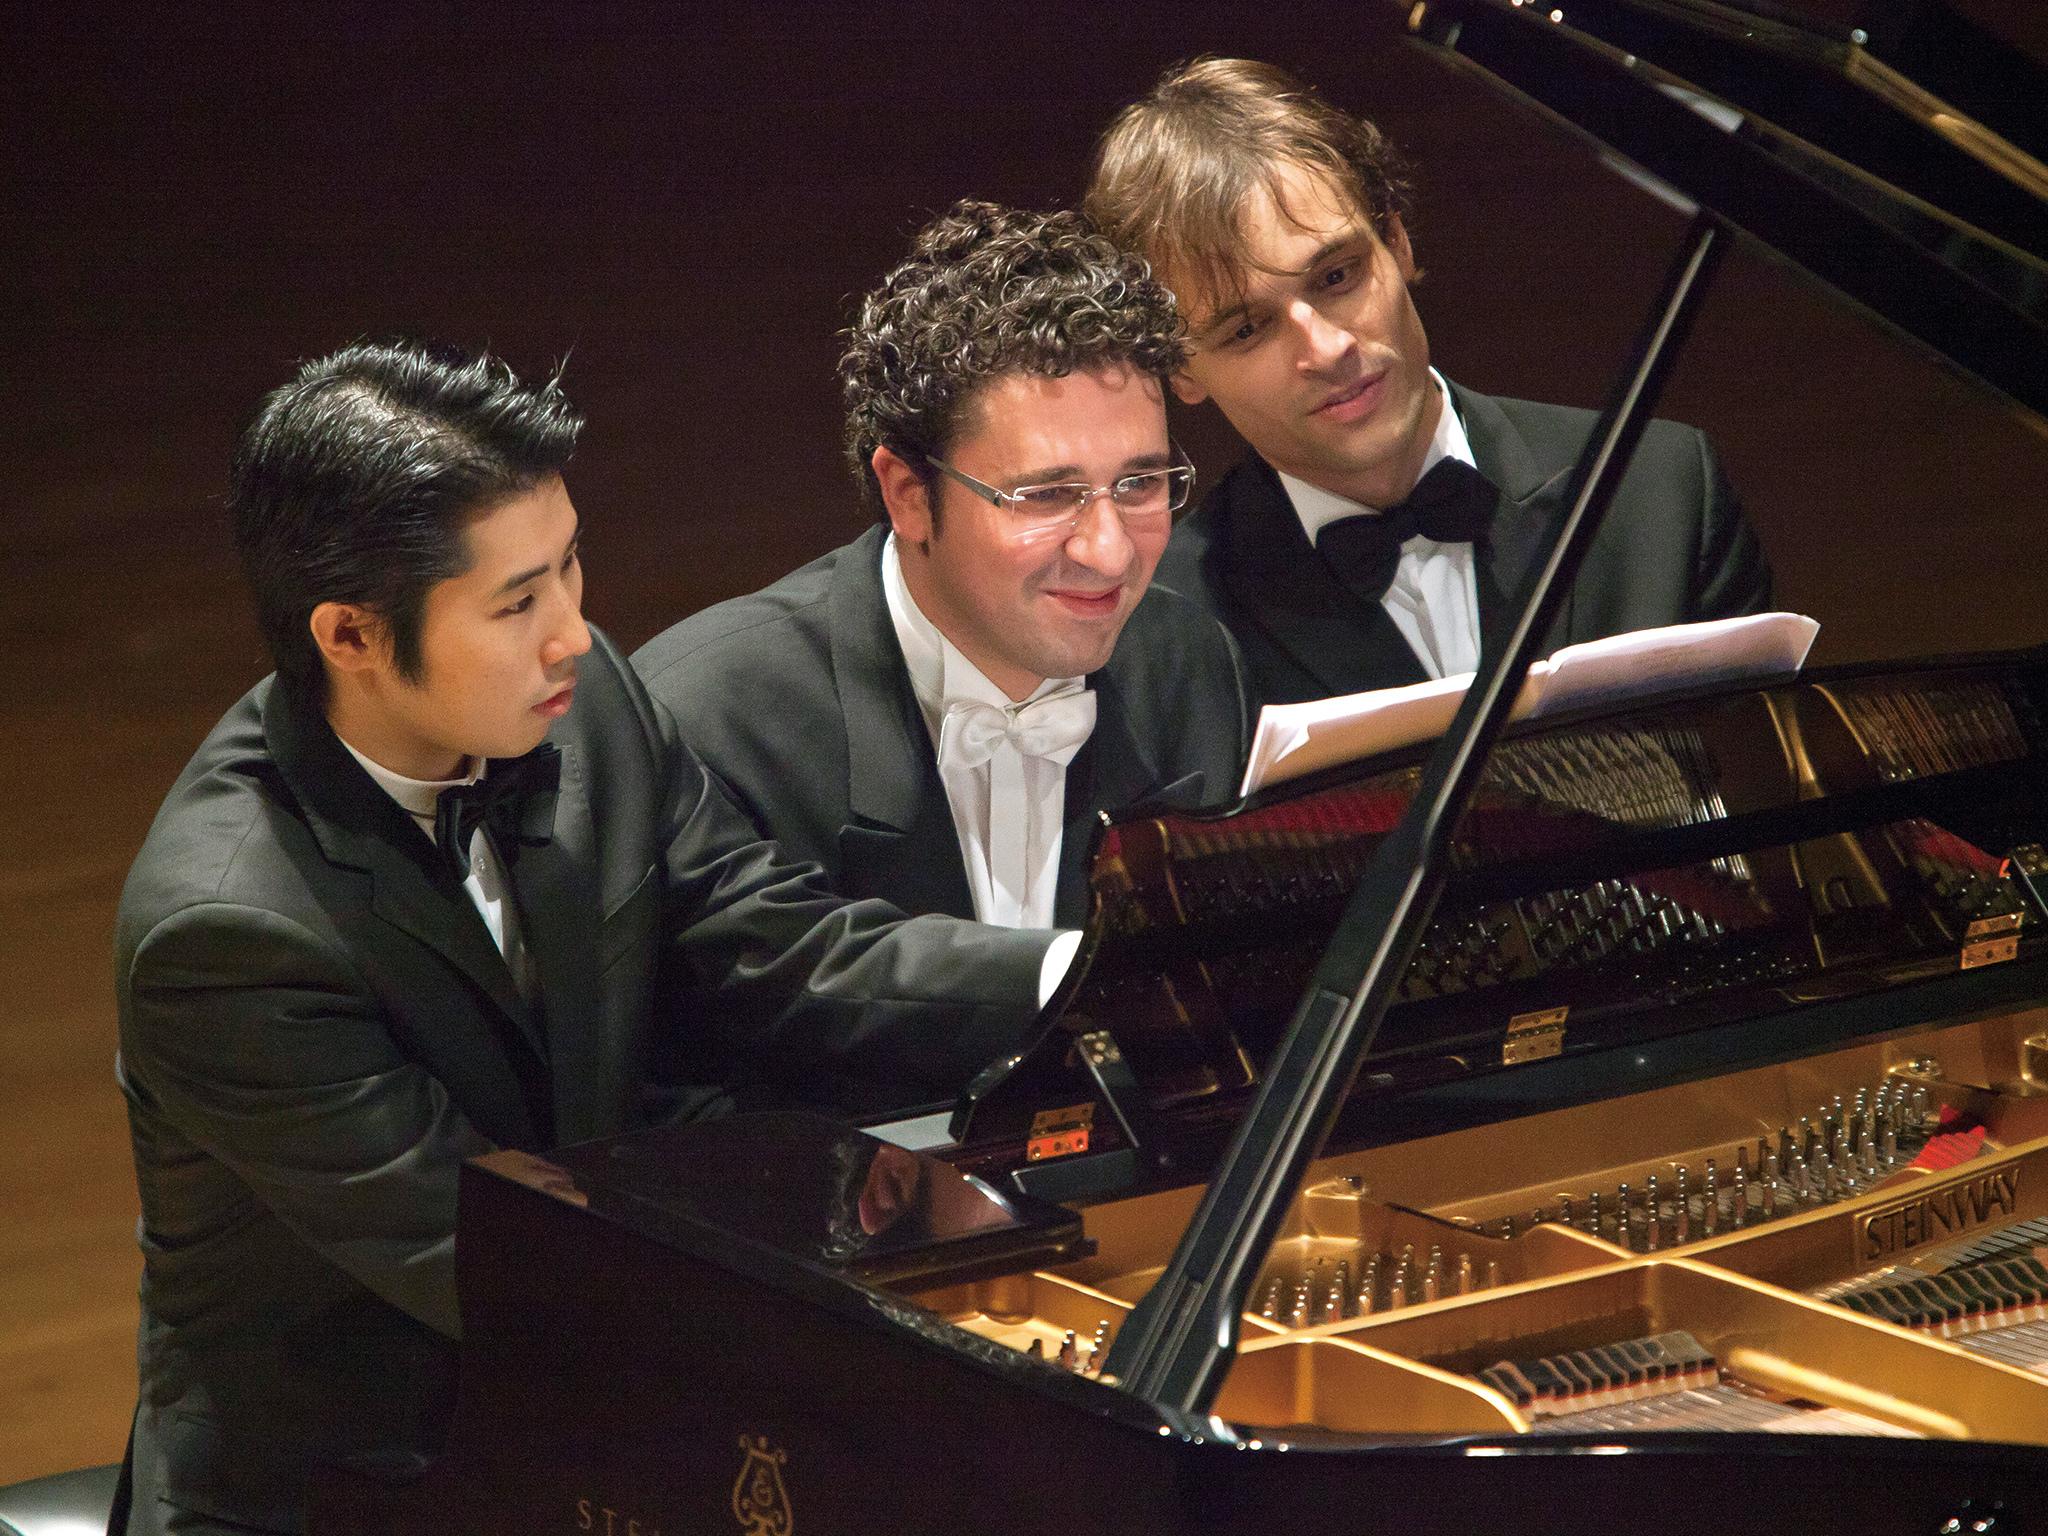 The Hong Kong International Piano Competition returns